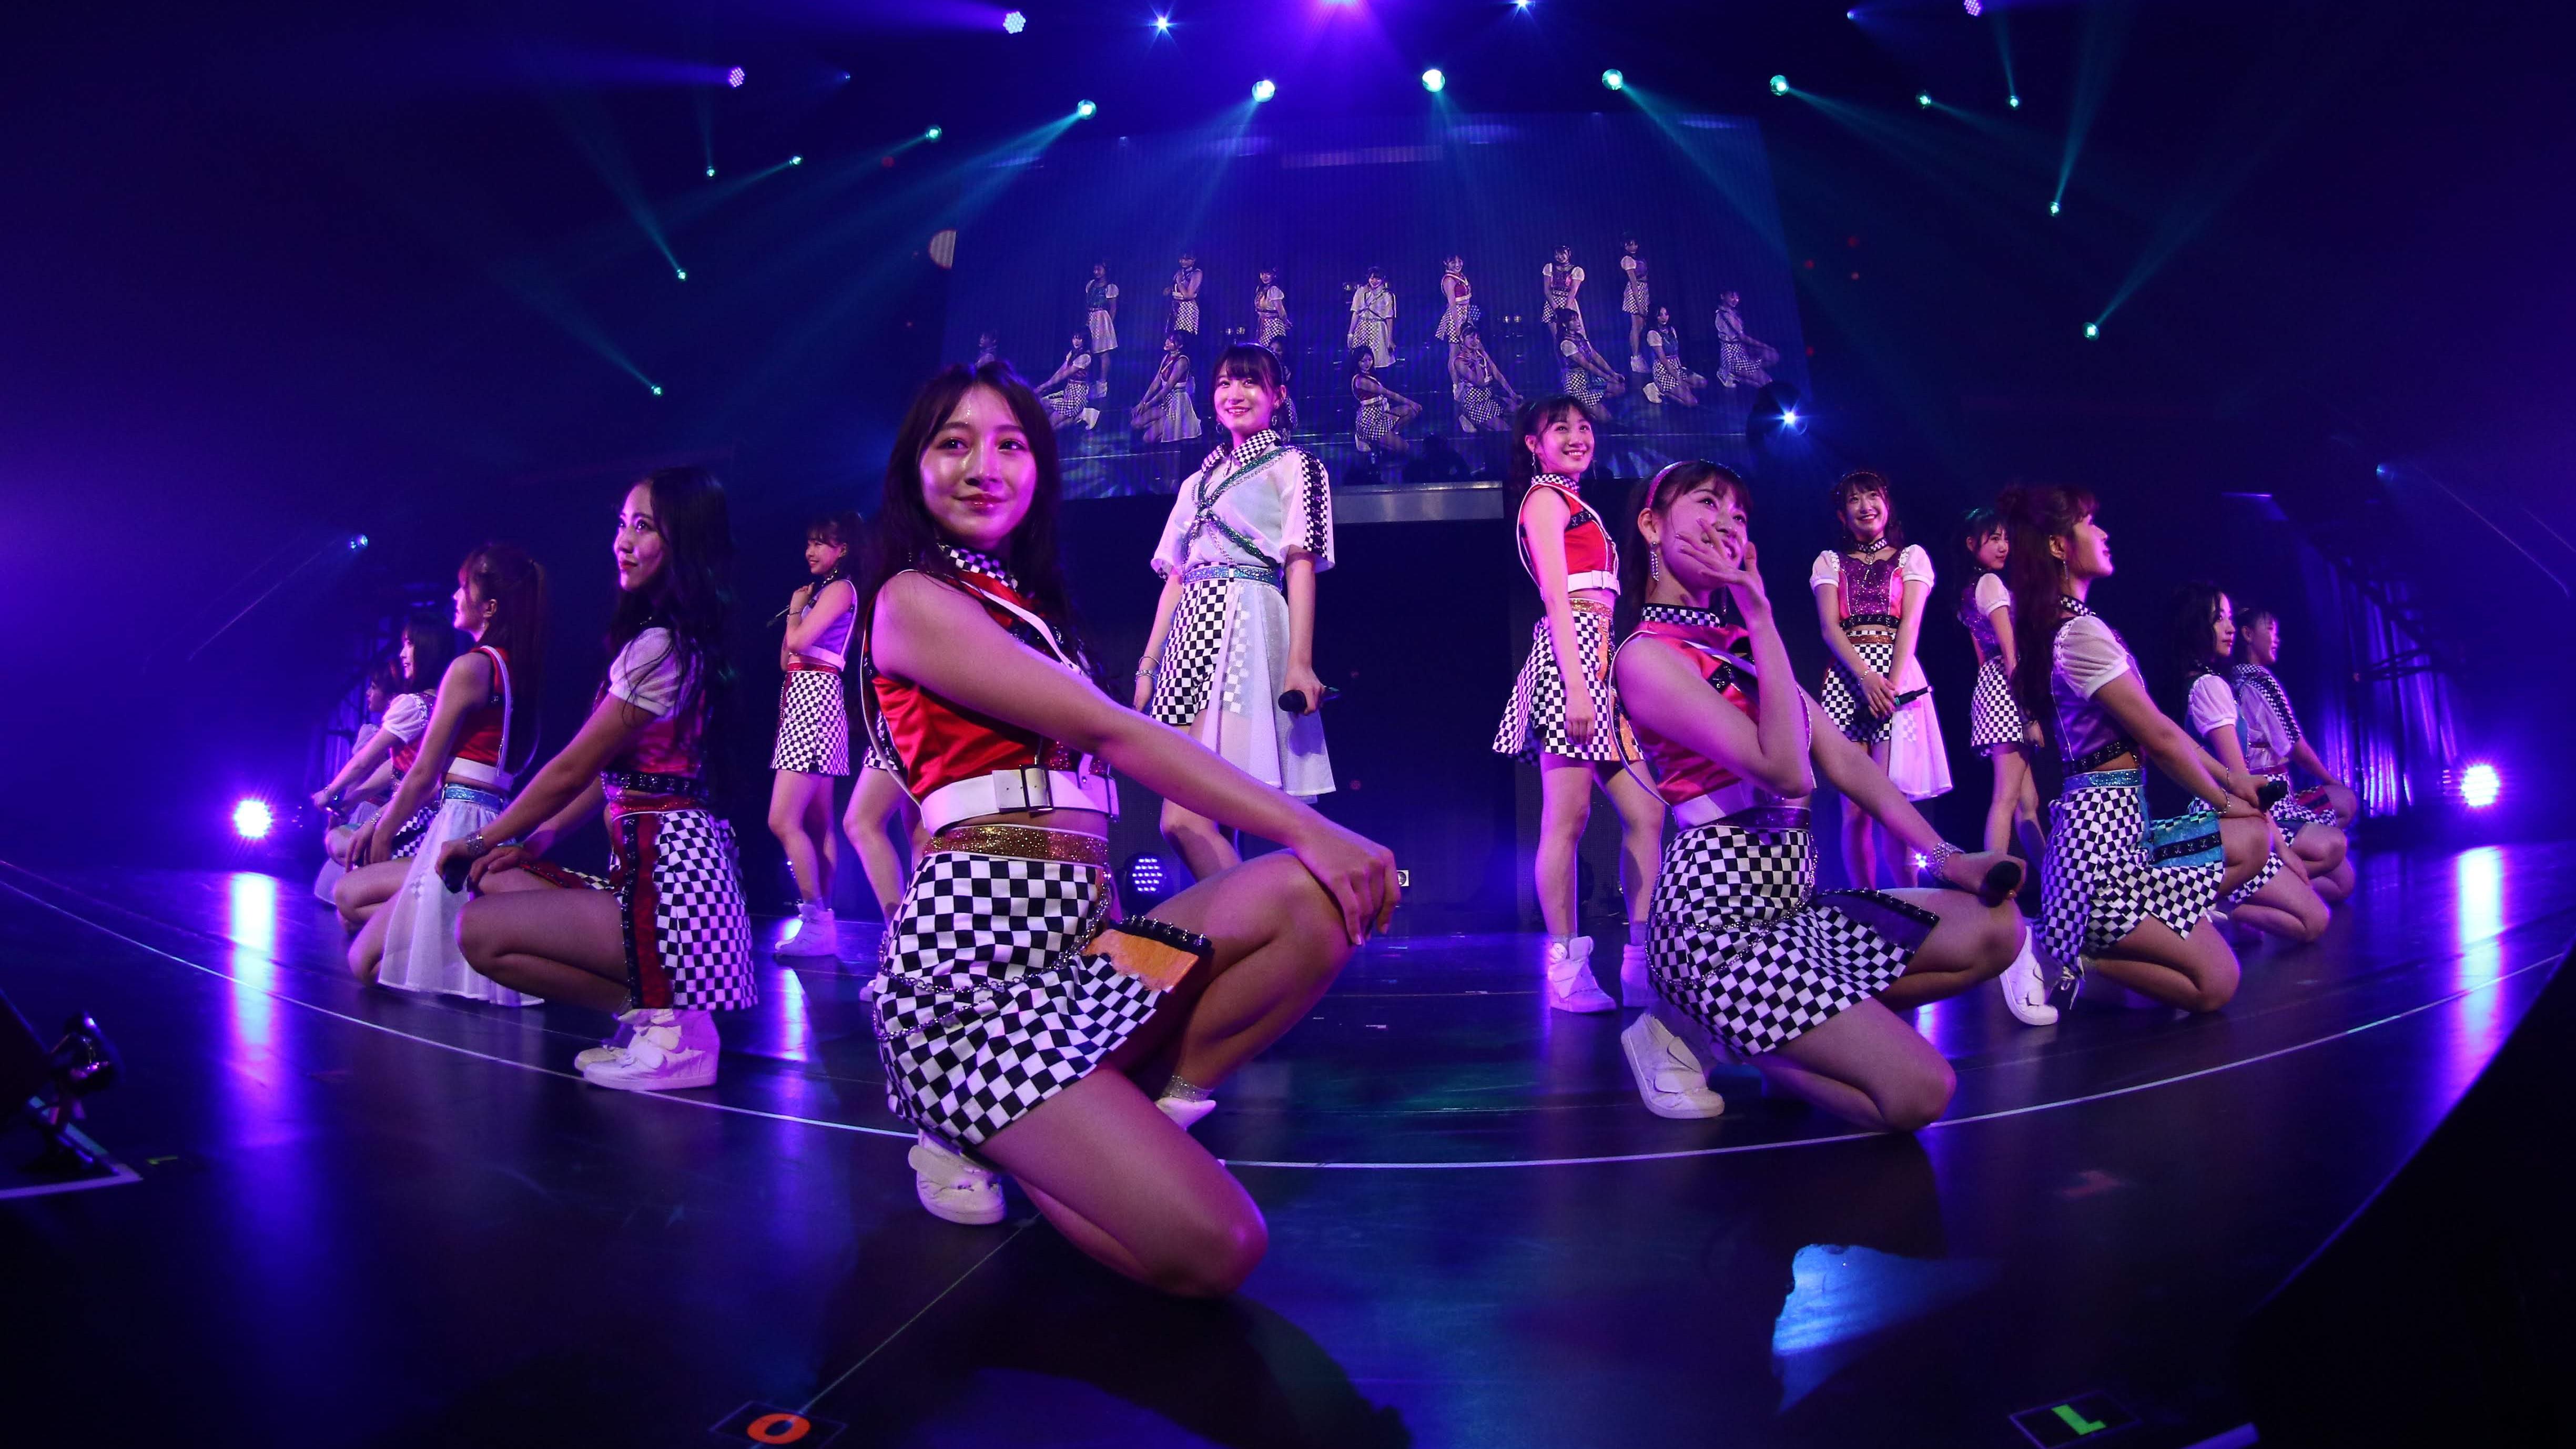 【NMB48】1.19「NMB48選抜メンバーコンサート」セットリスト・衣装総選挙結果・ライブ画像など